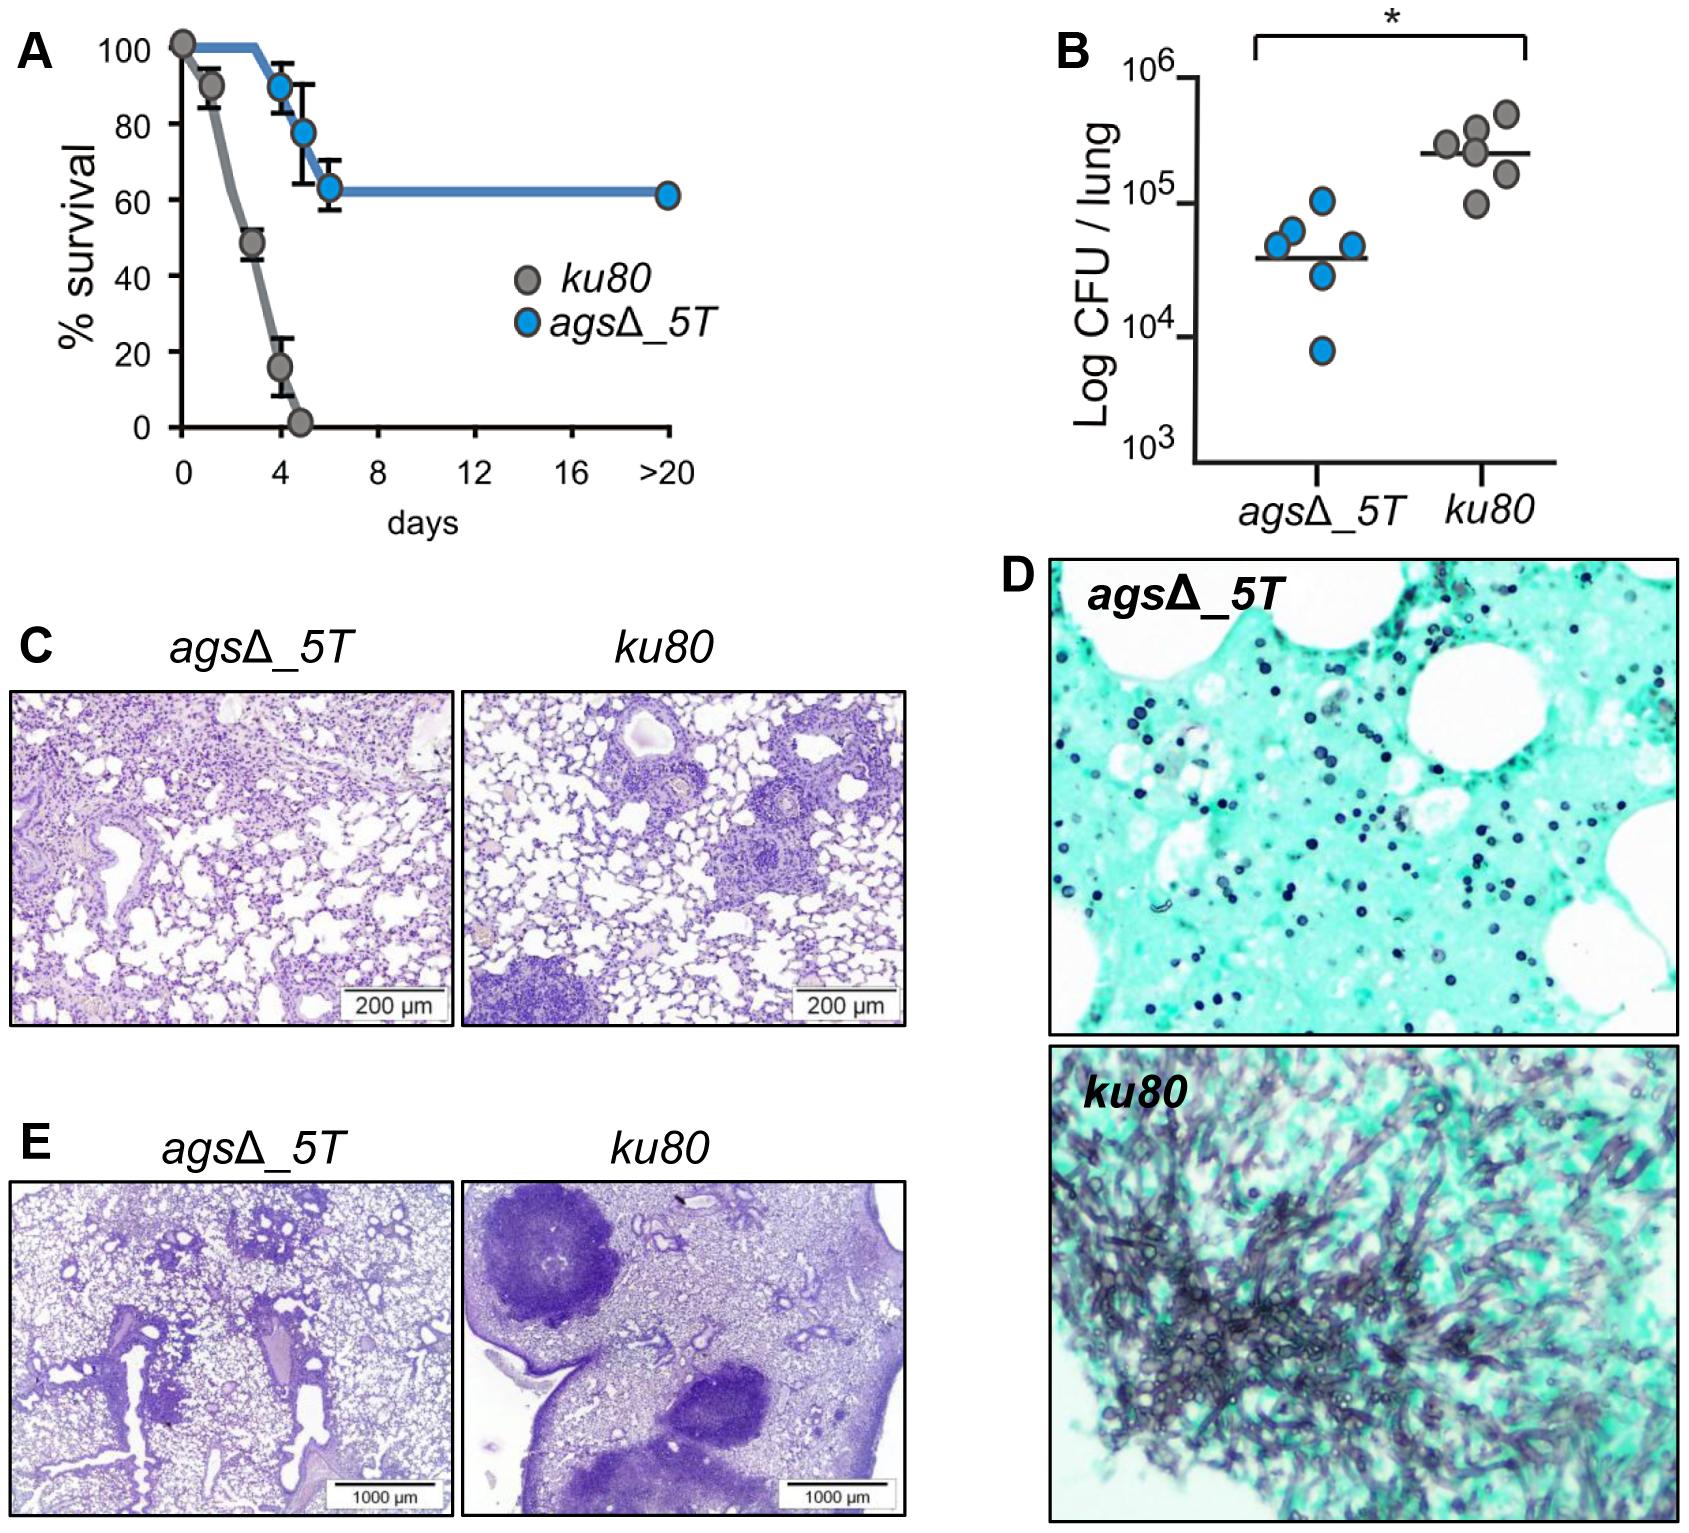 Cyclophosphamide immunosuppressed mice and anti-Ly6G treated neutropenic mice infected with resting conidia of <i>ags</i>Δ_<i>5T</i> and parental (<i>ku80</i>) strains.